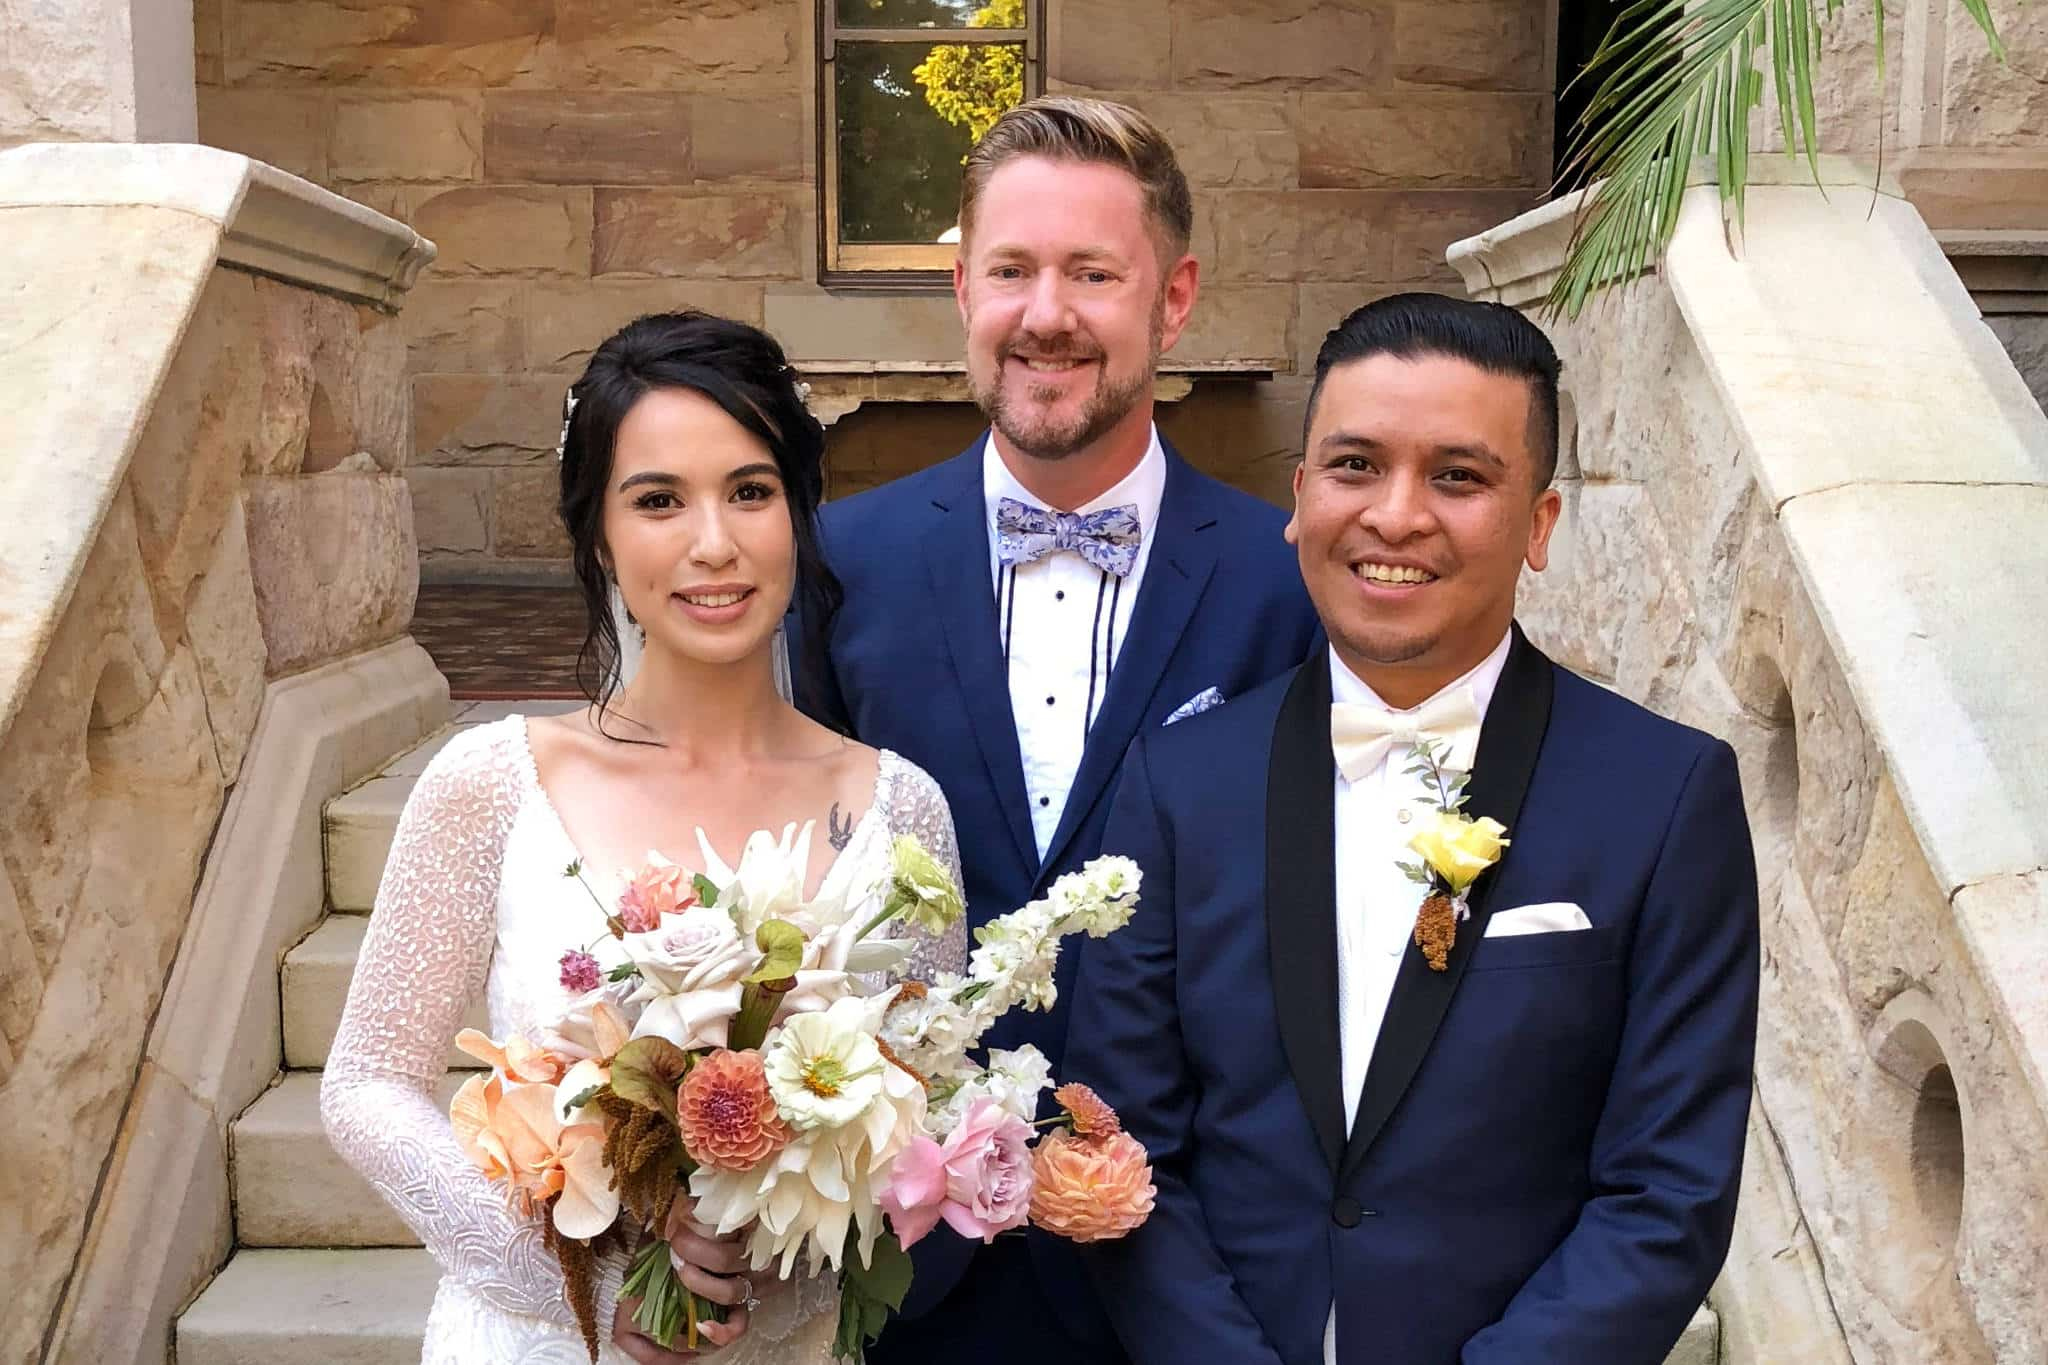 Curzon Hall Wedding - Stephen Lee Sydney Marriage Celebrant